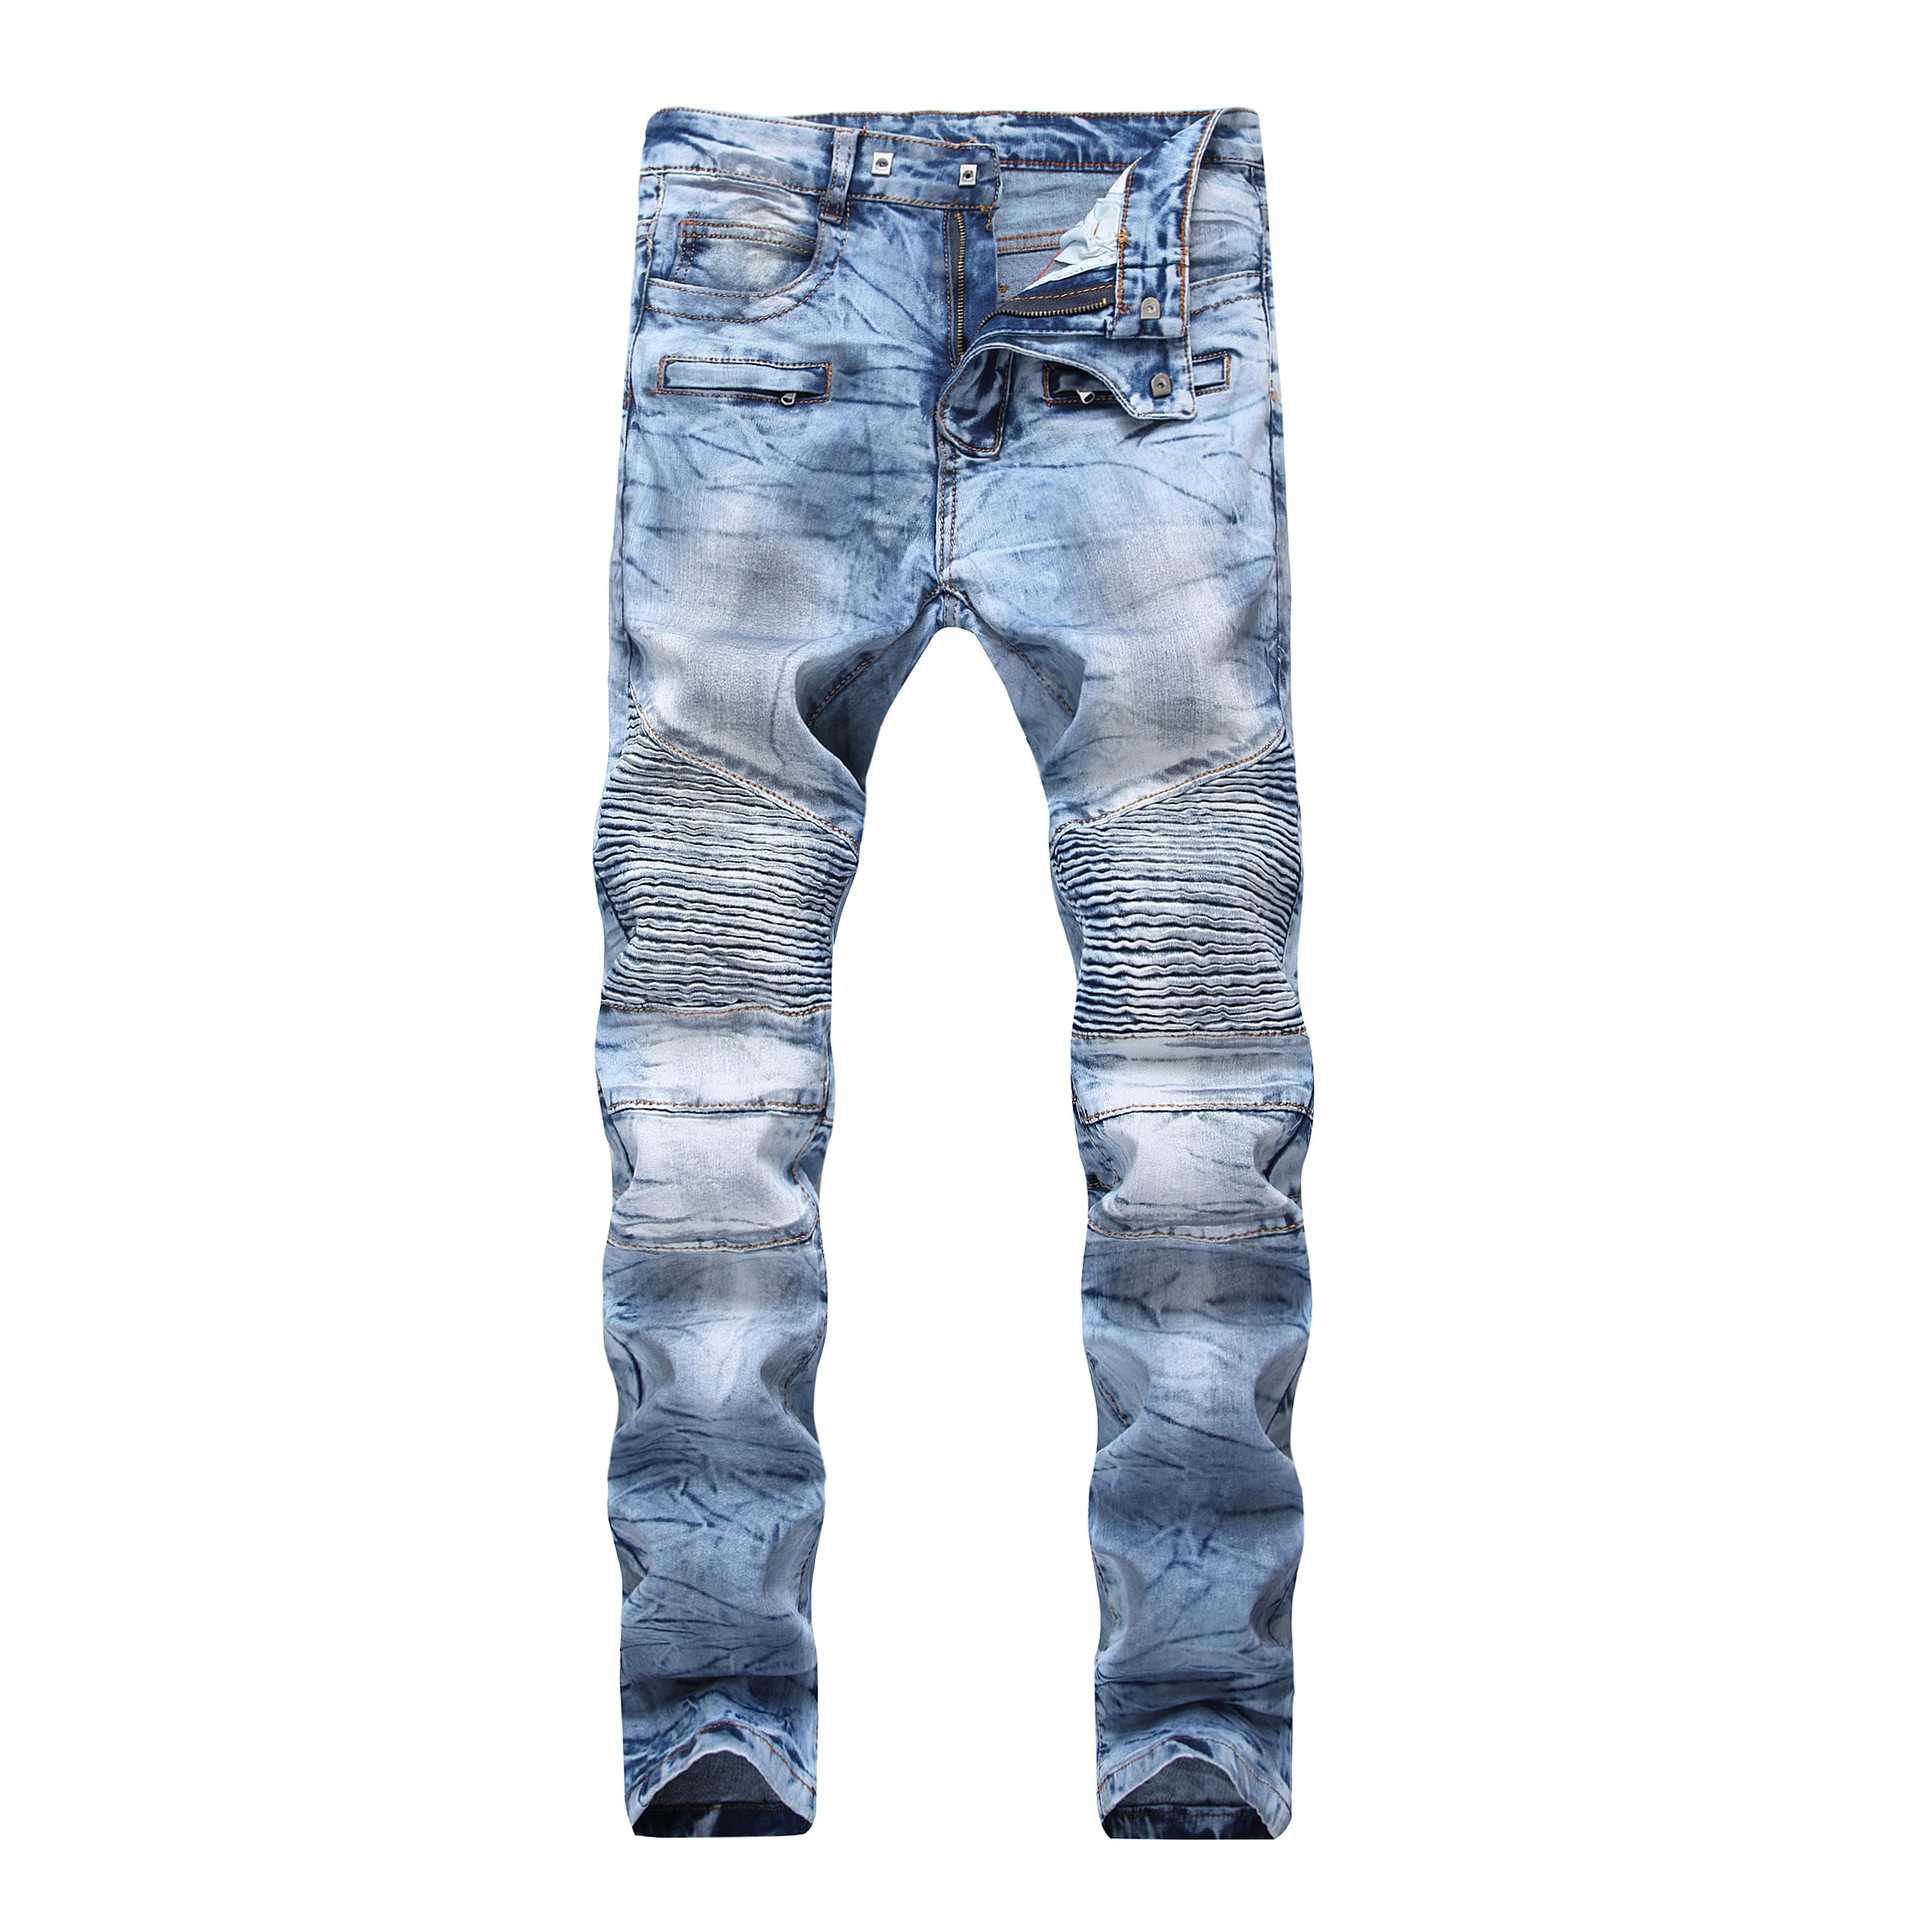 Sokotoo Men's Dirty Light Blue Biker Jeans For Motorcycle Slim Fit Stretch Denim Straight Pants